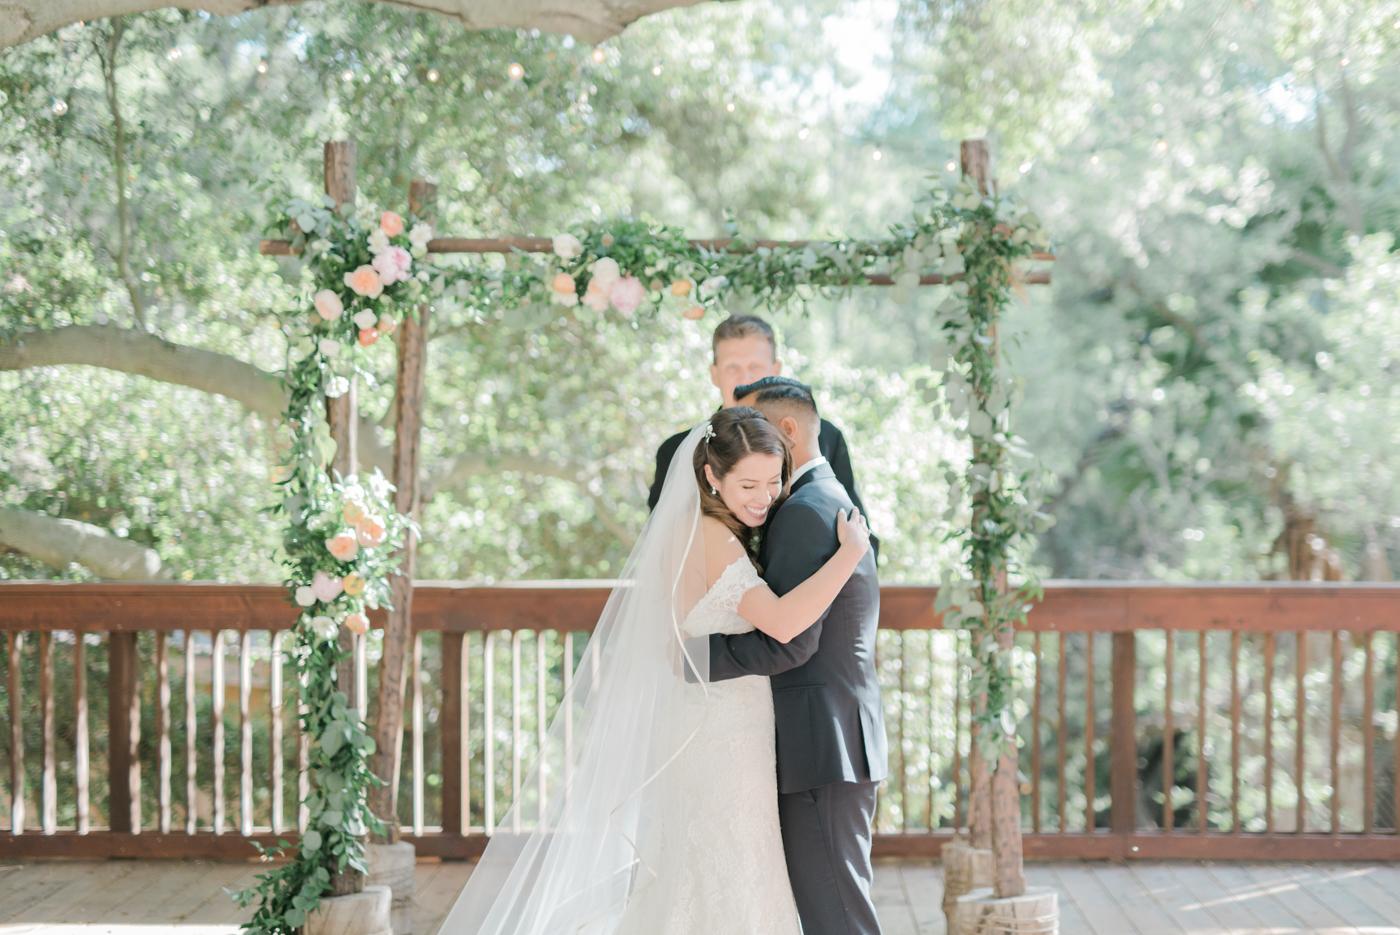 l&c-the_1909_spring_garden_wedding_los_angeles_fine_art_wedding_photographer-18.jpg